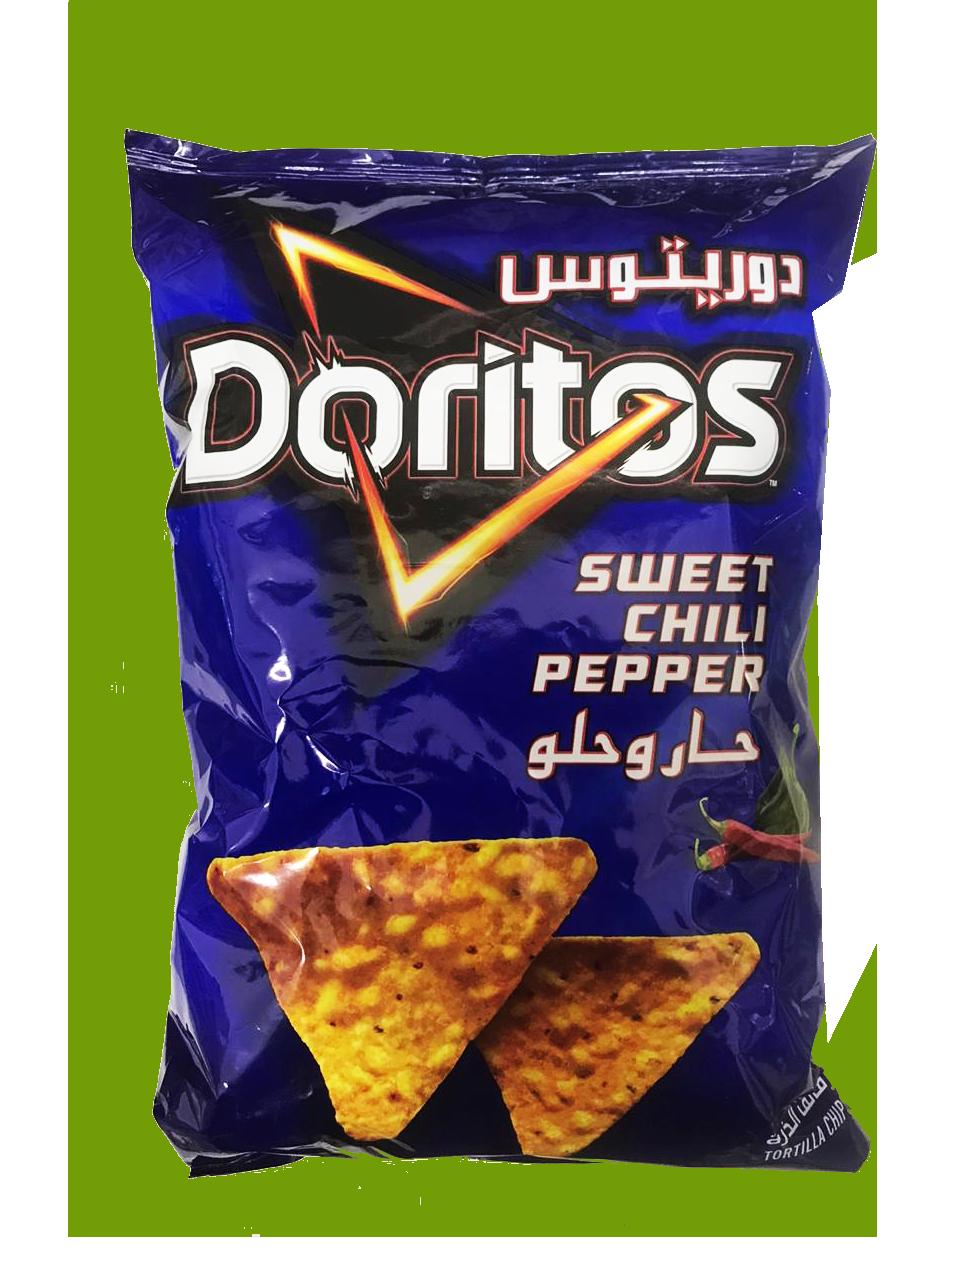 Doritos Sweet Chili Pepper 185g